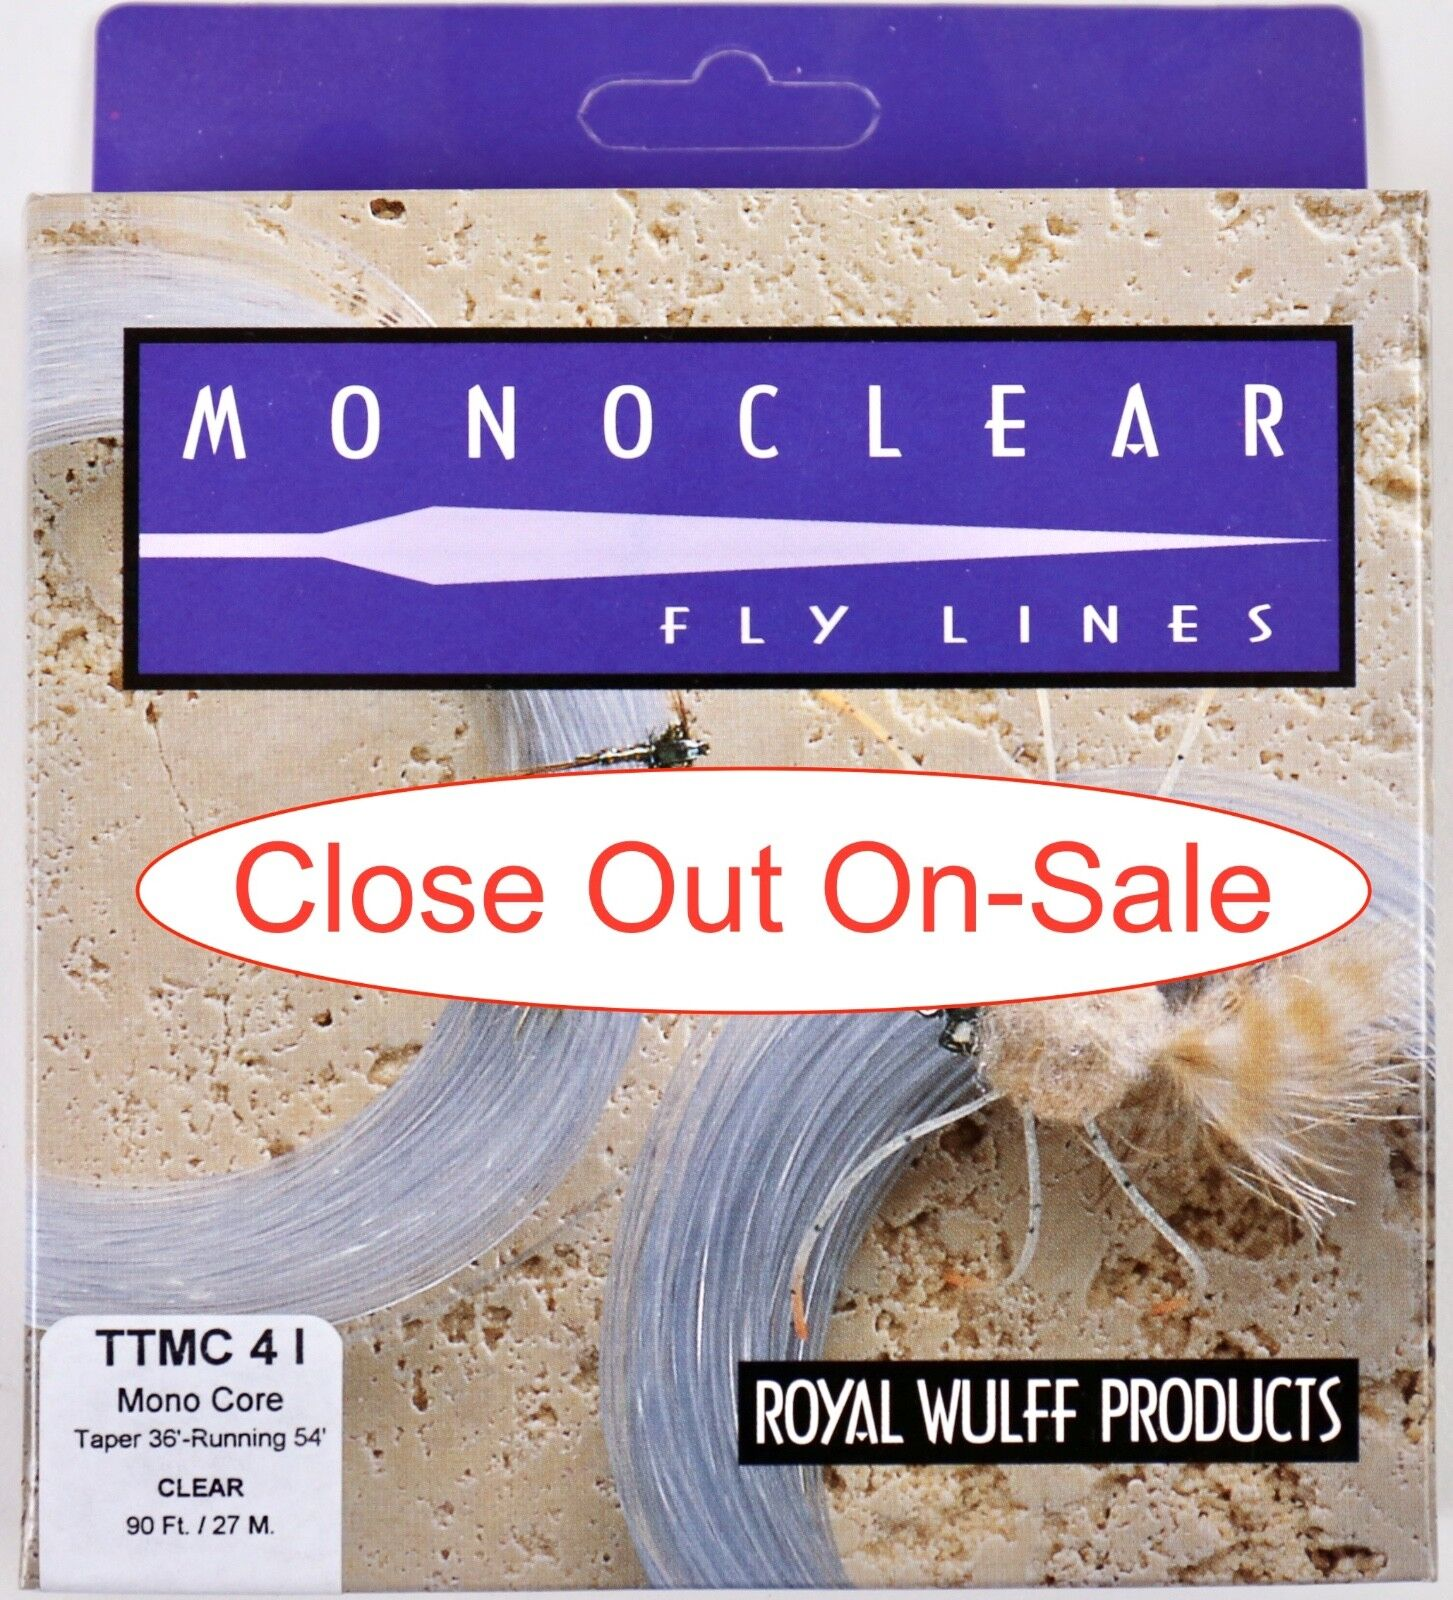 Royal Wulff Triangle Taper Monoclear Intermediate 4 WT Fly Line TTMC4I